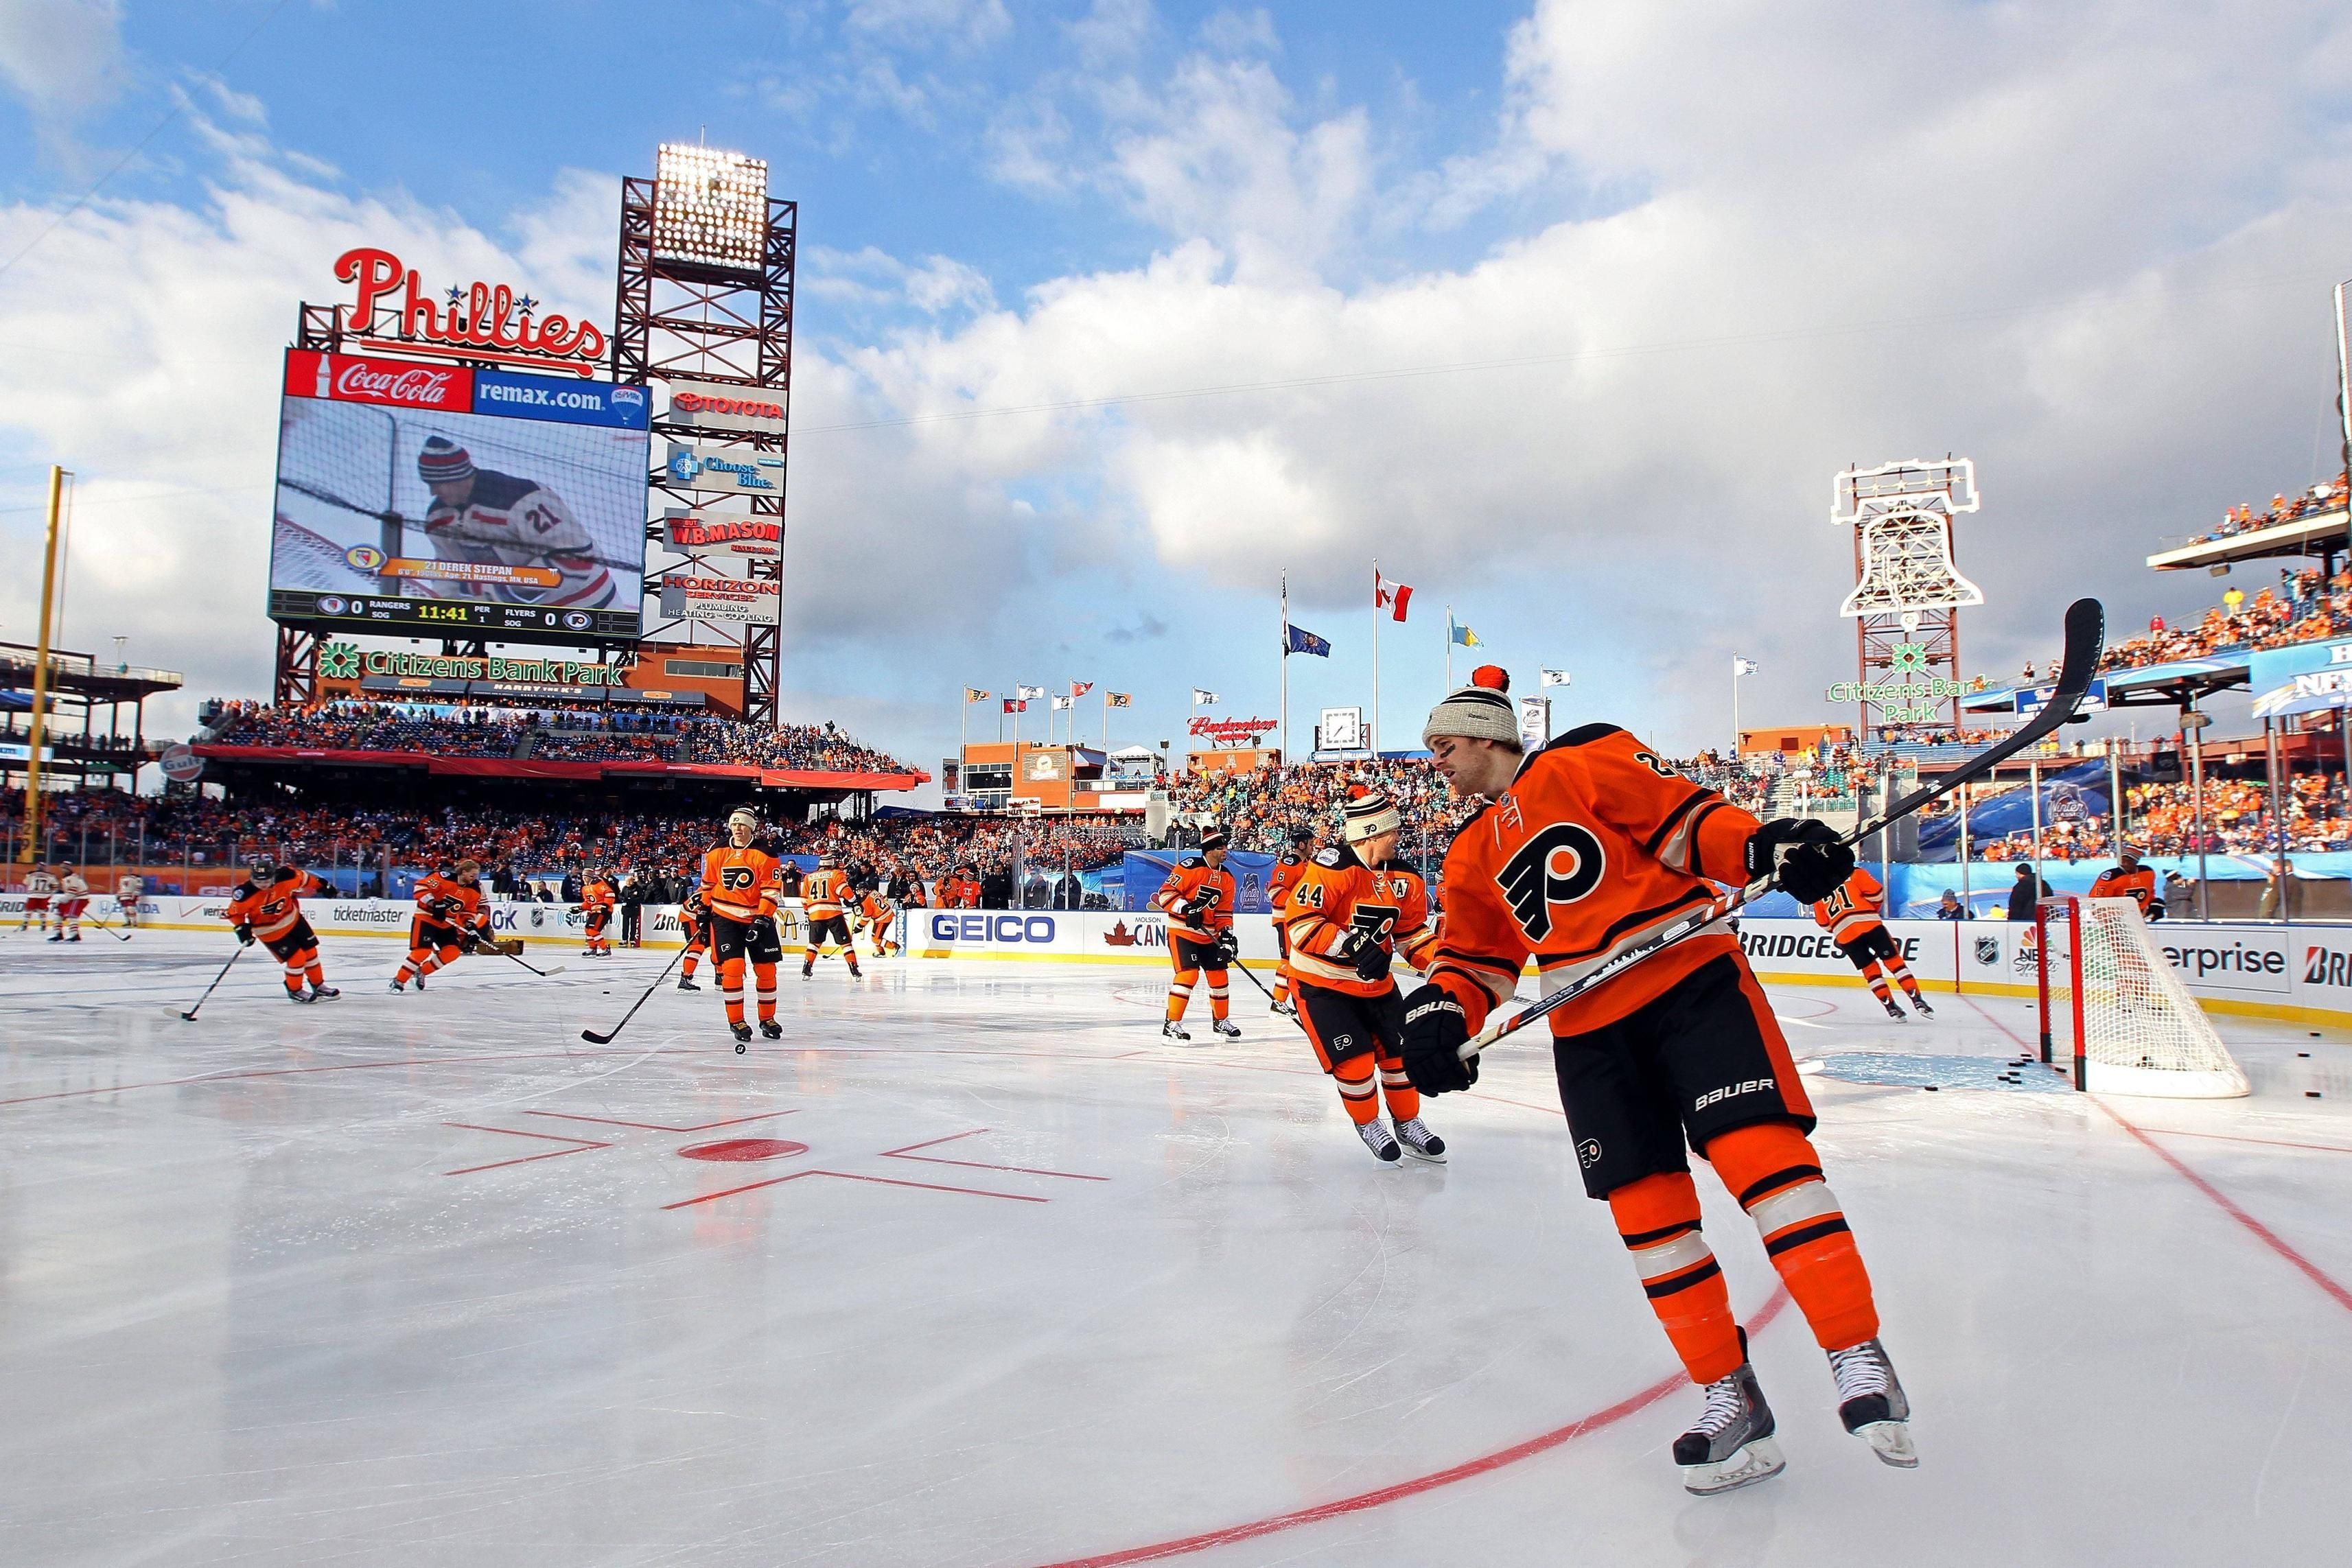 Philadelphia Flyers Nhl Hockey 34 Wallpaper 4896 3264 344884 Philadelphia Flyers Nhl Winter Classic Philadelphia Flyers Logo